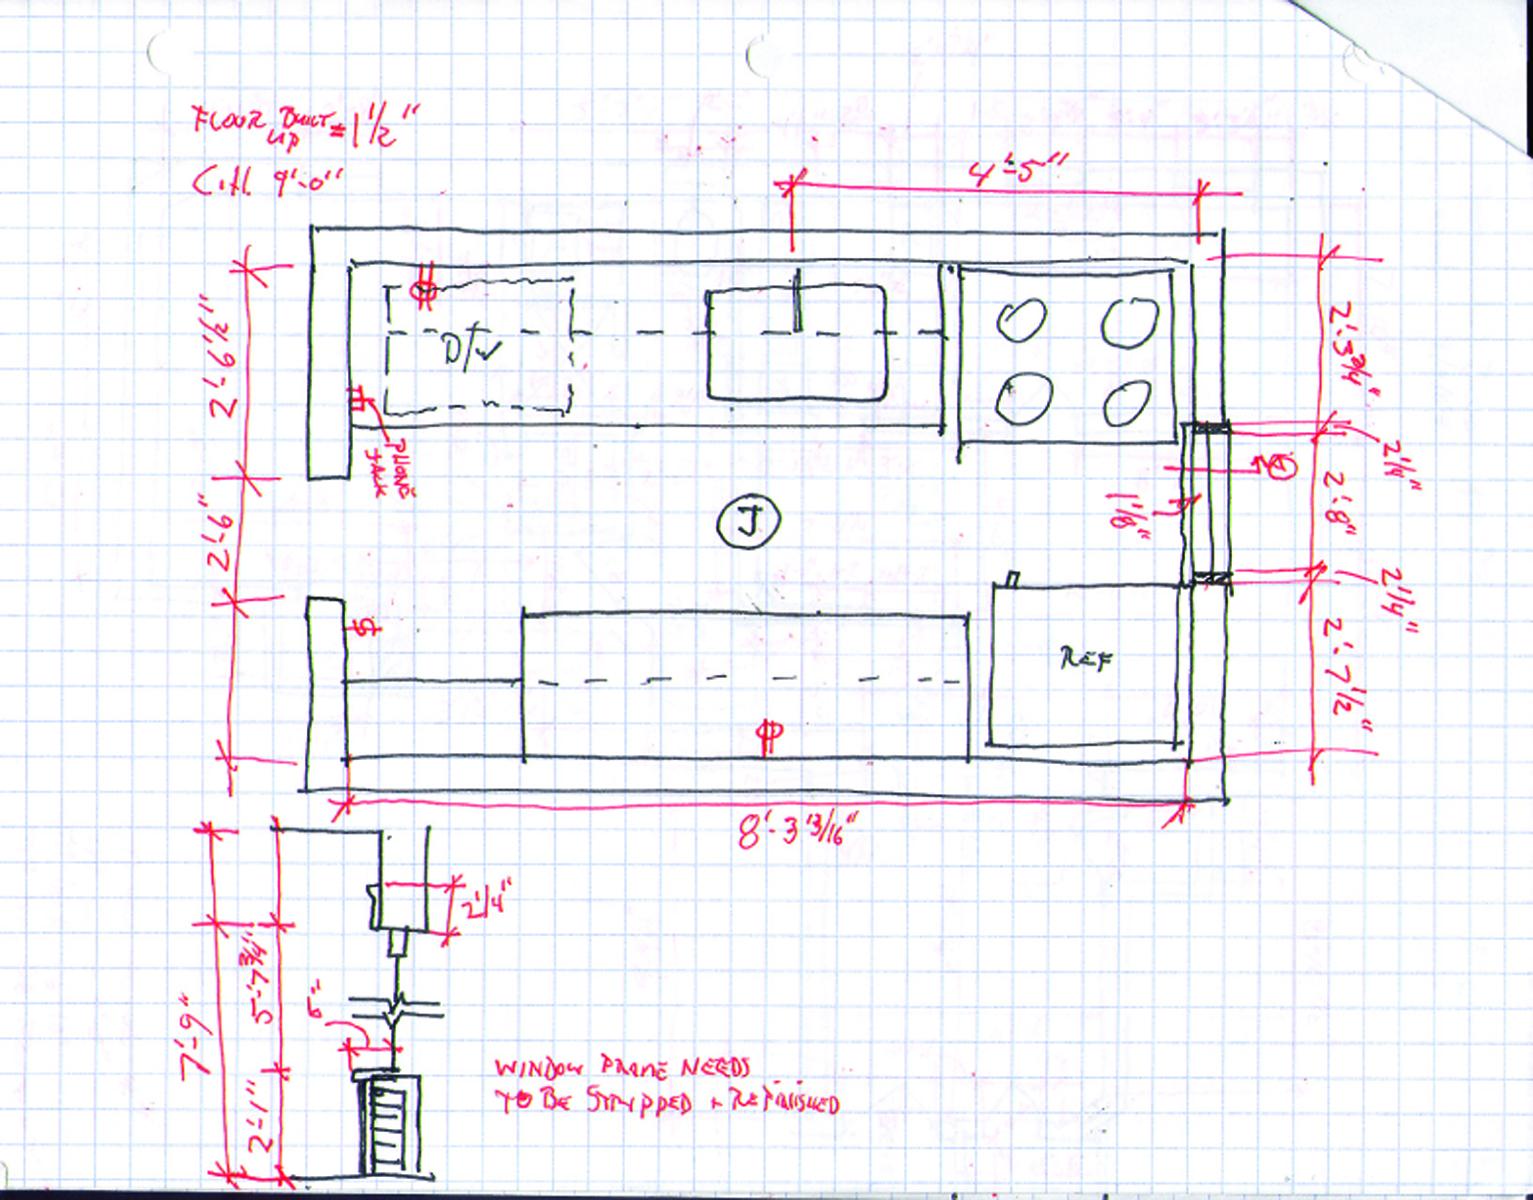 Worksheet Architectural Measurements Worksheet Fun Worksheet Study Site